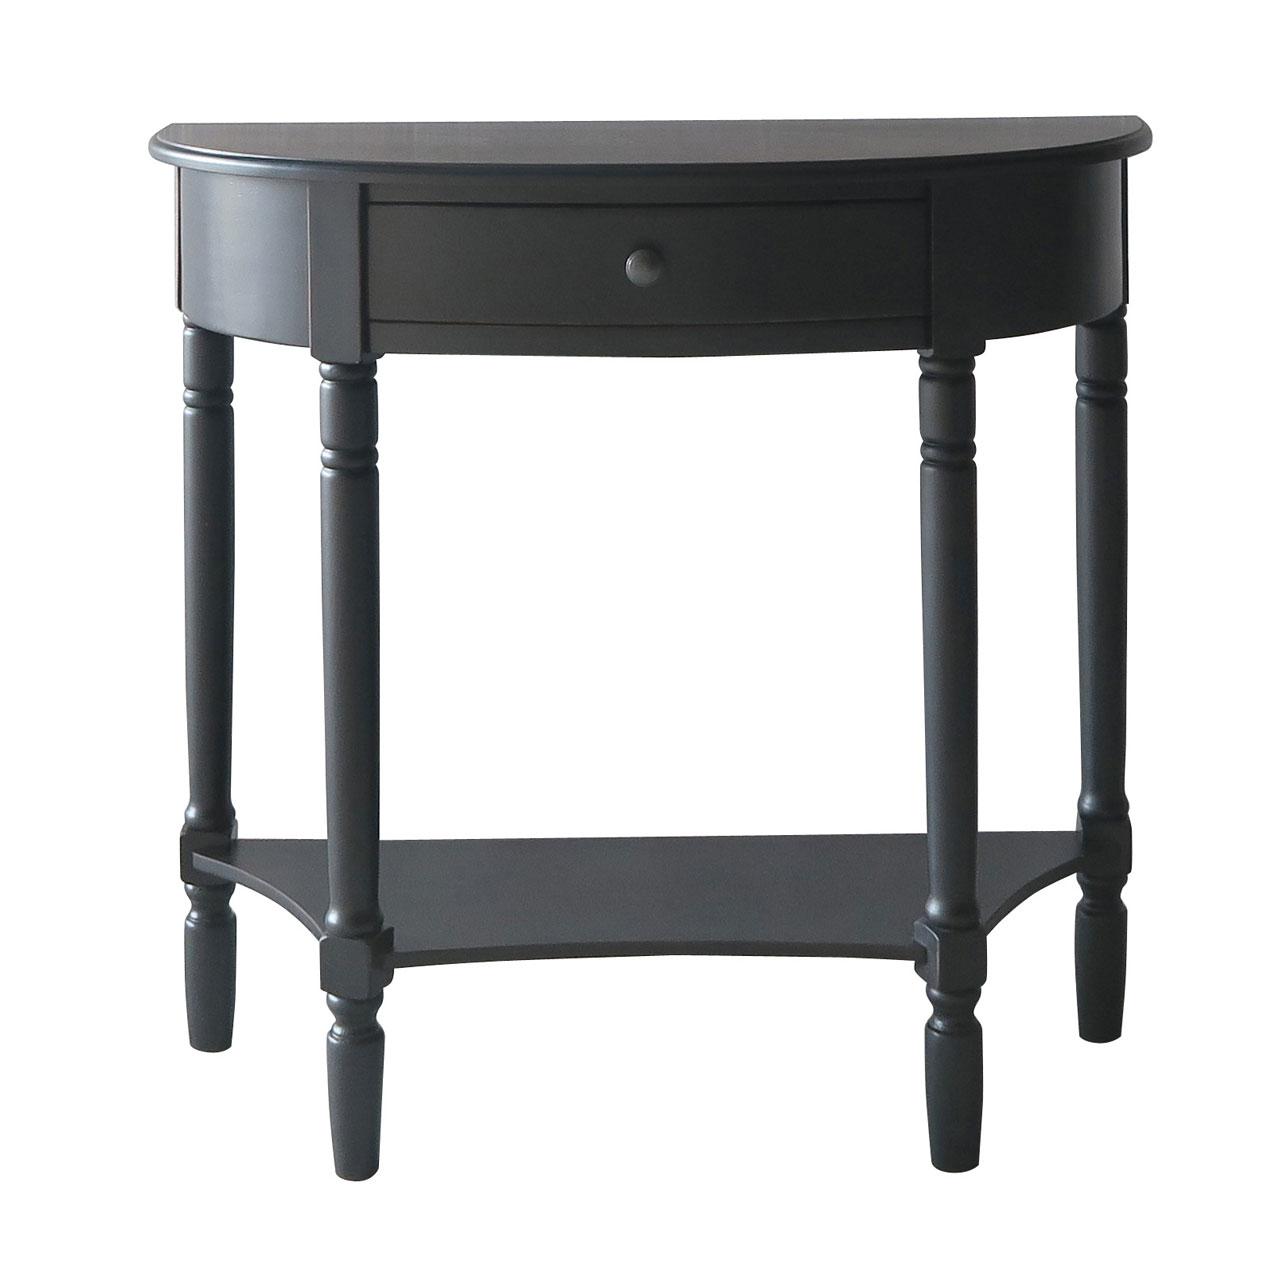 Heritage Console Table Half Moon Black 1 Drawer Pine Wood Hallway Furniture